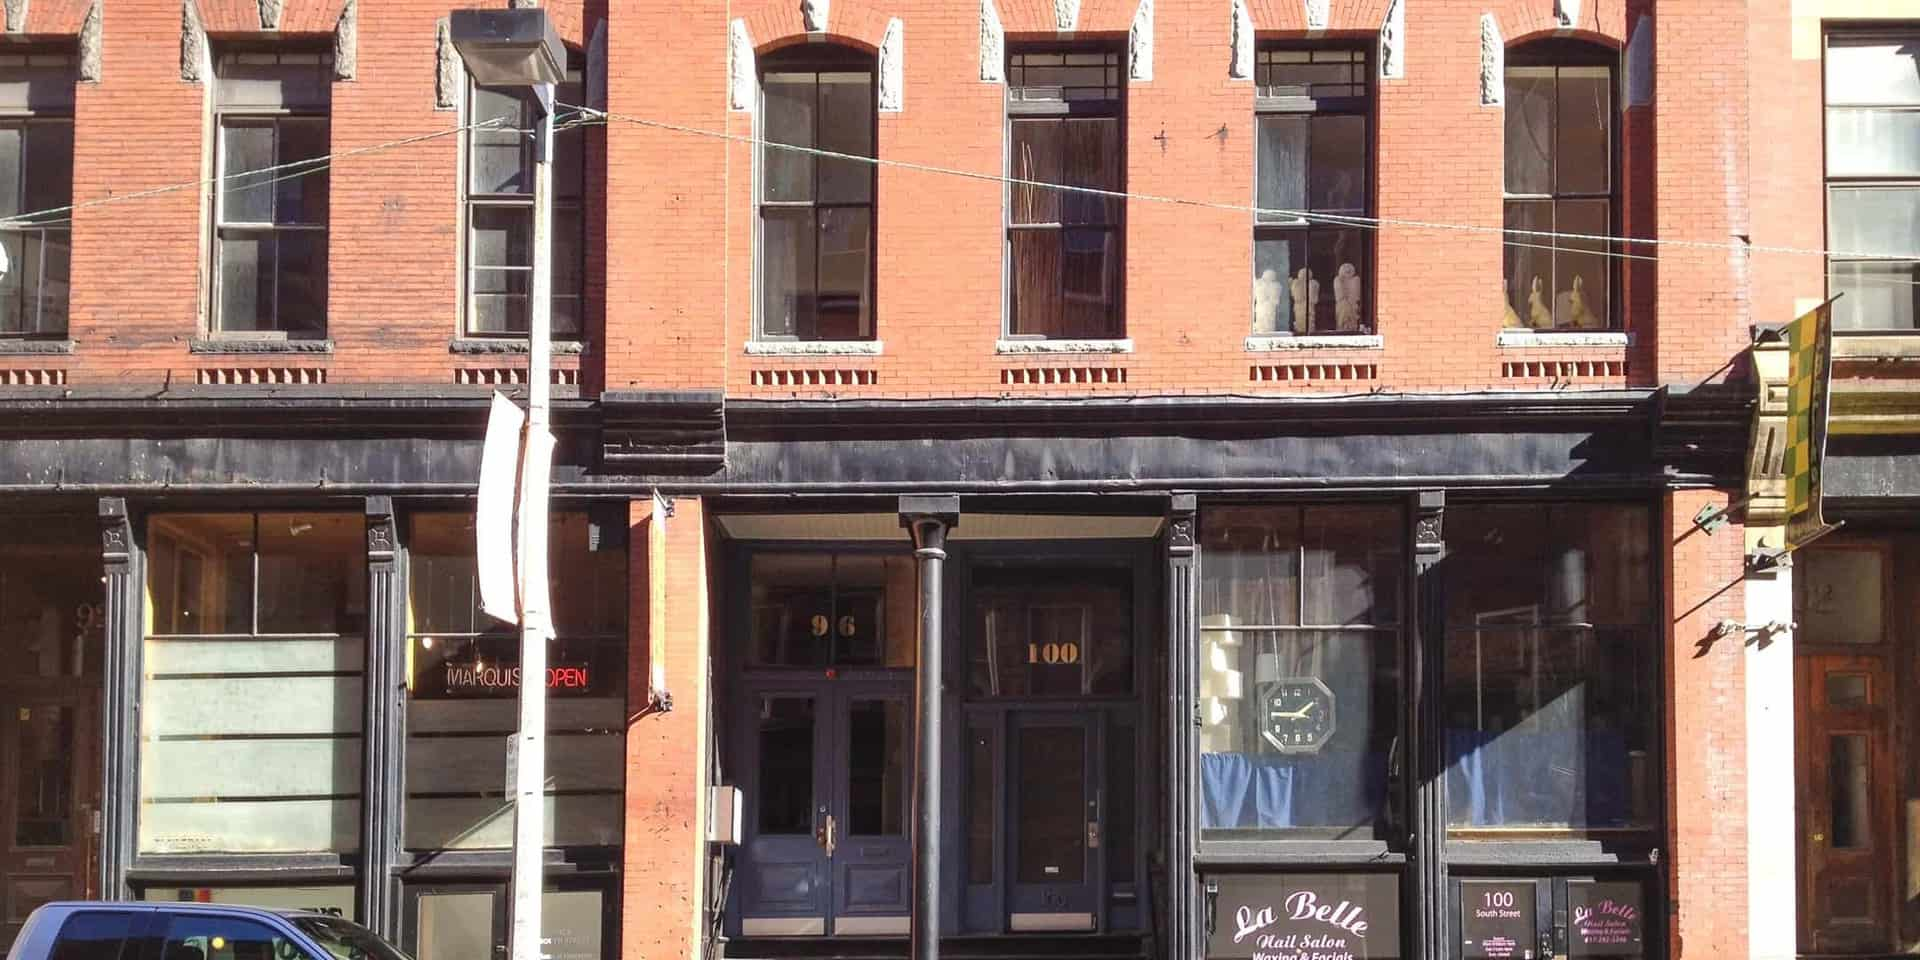 96 South Street Lofts